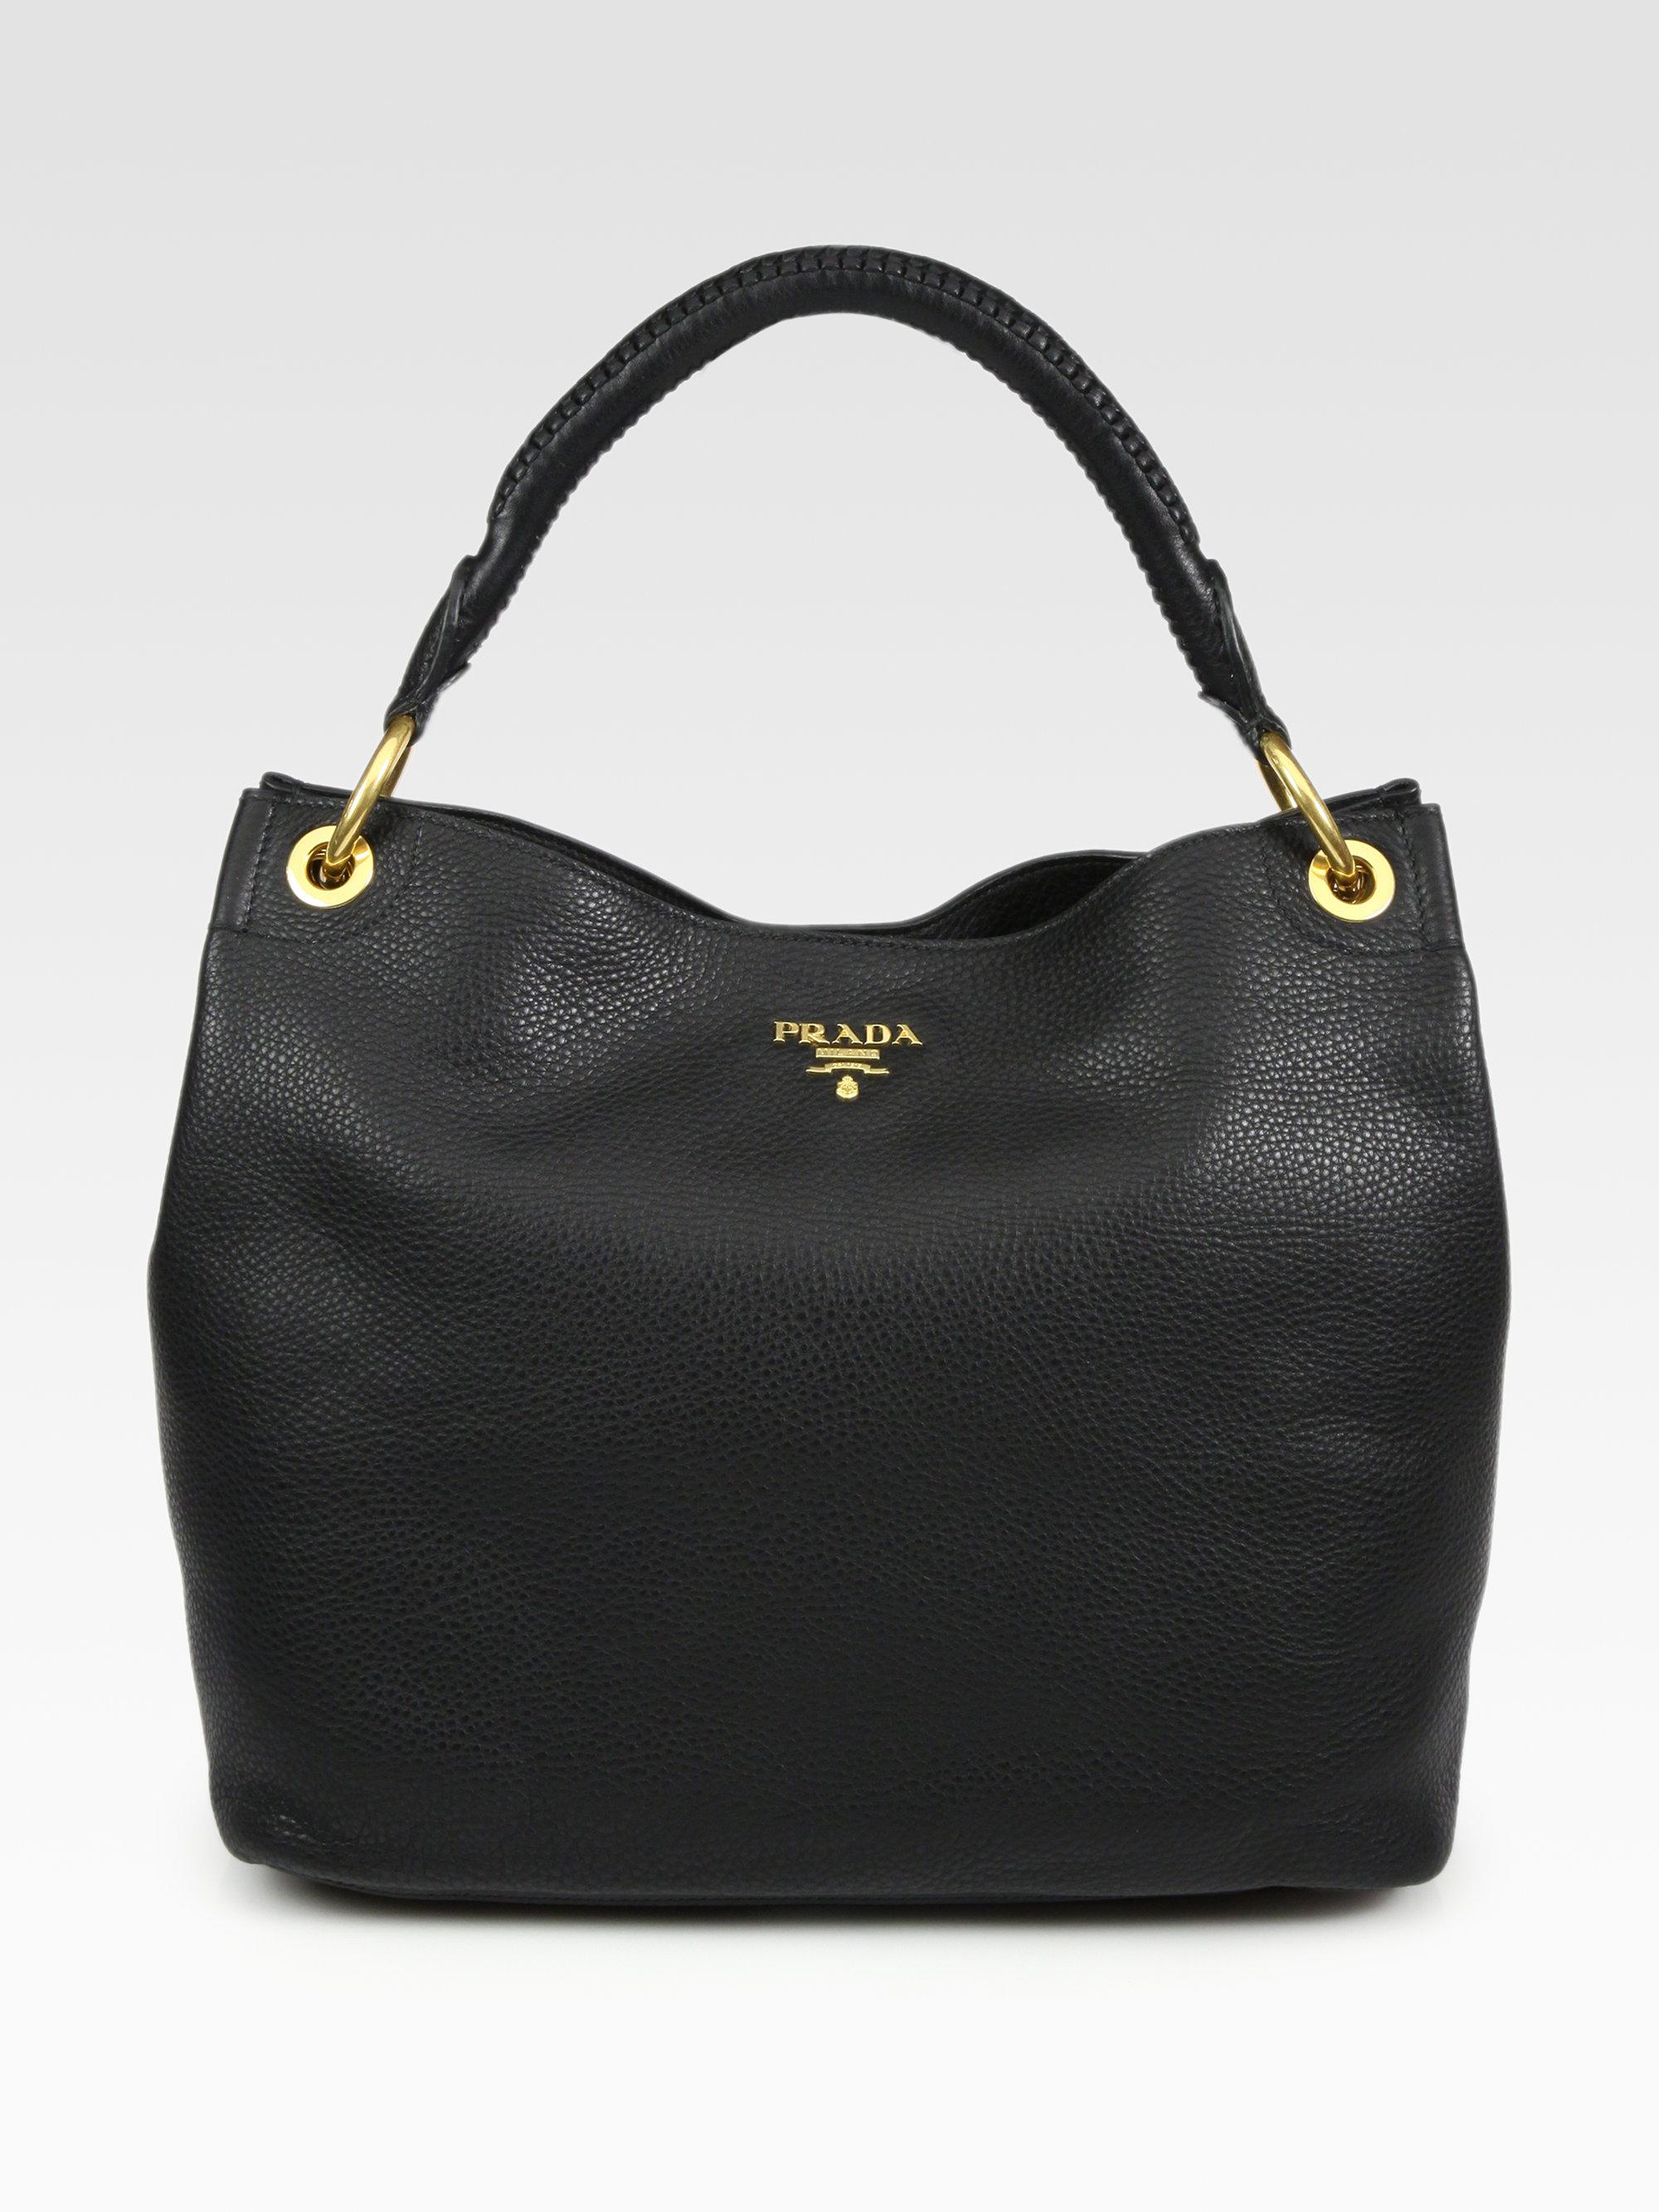 free shipping lyst prada vitello daino hobo bag in black baf7d d3724 652acf3743